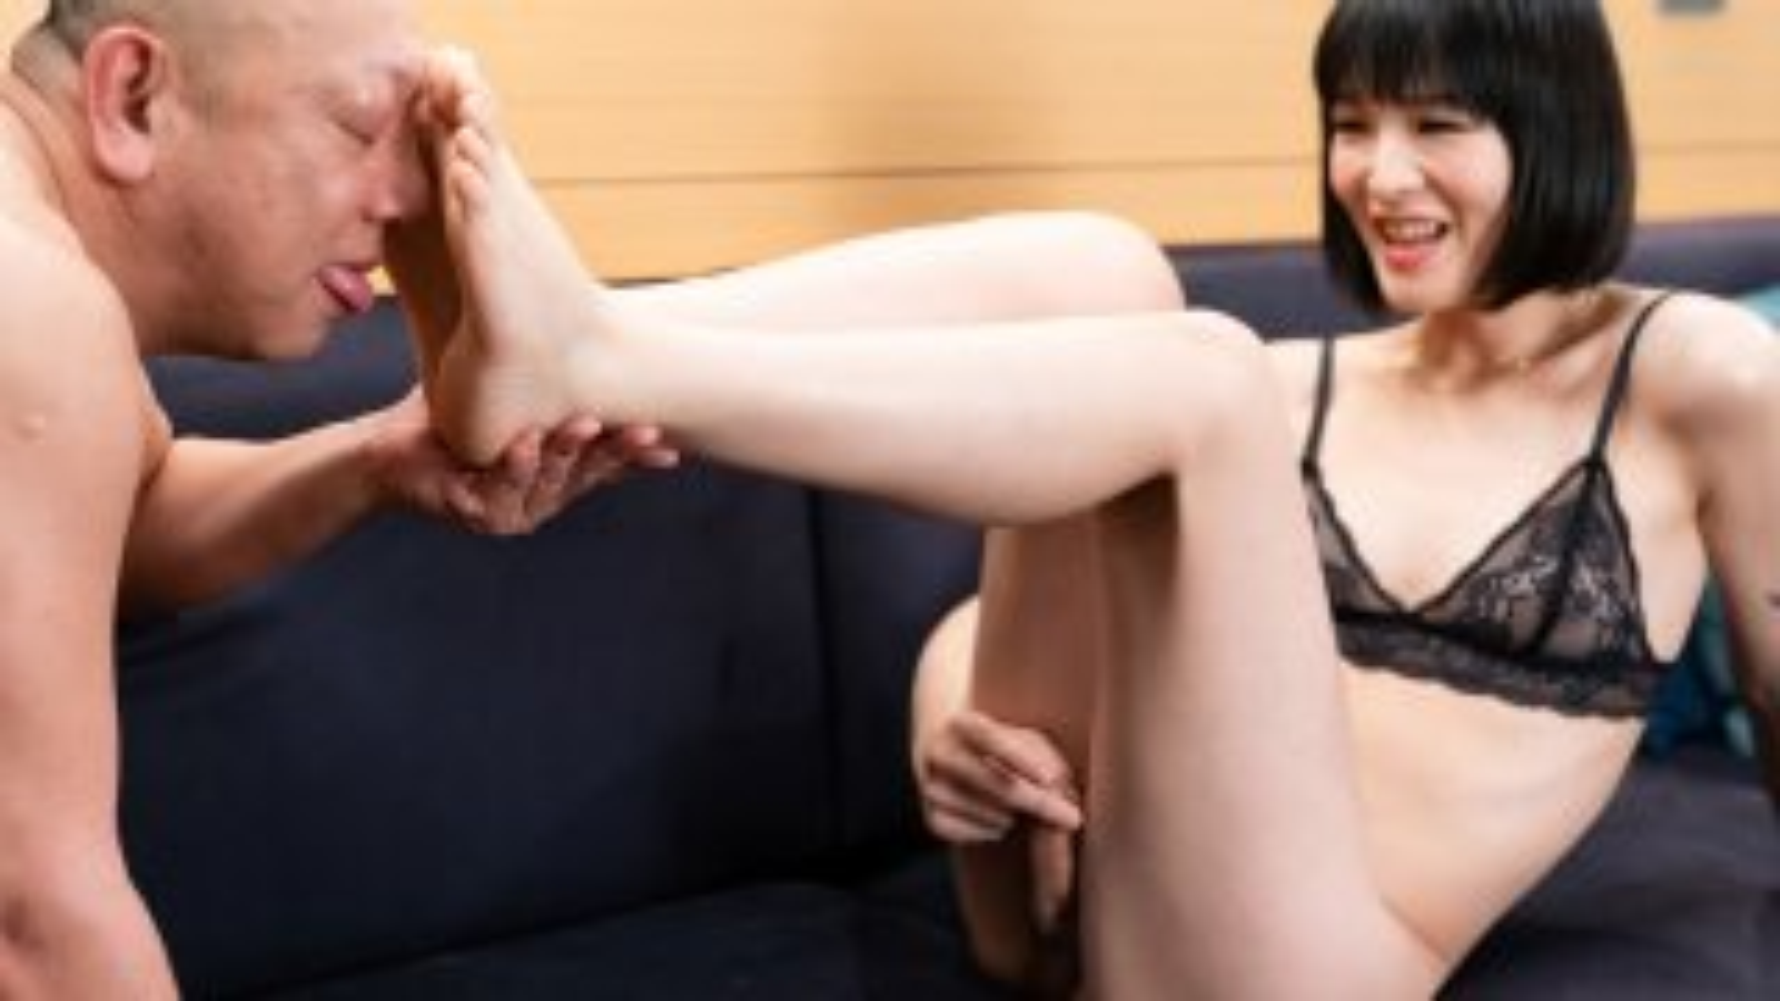 [2019-03-01] Yoko Feet Worship and Blow Job - TranSexJapan